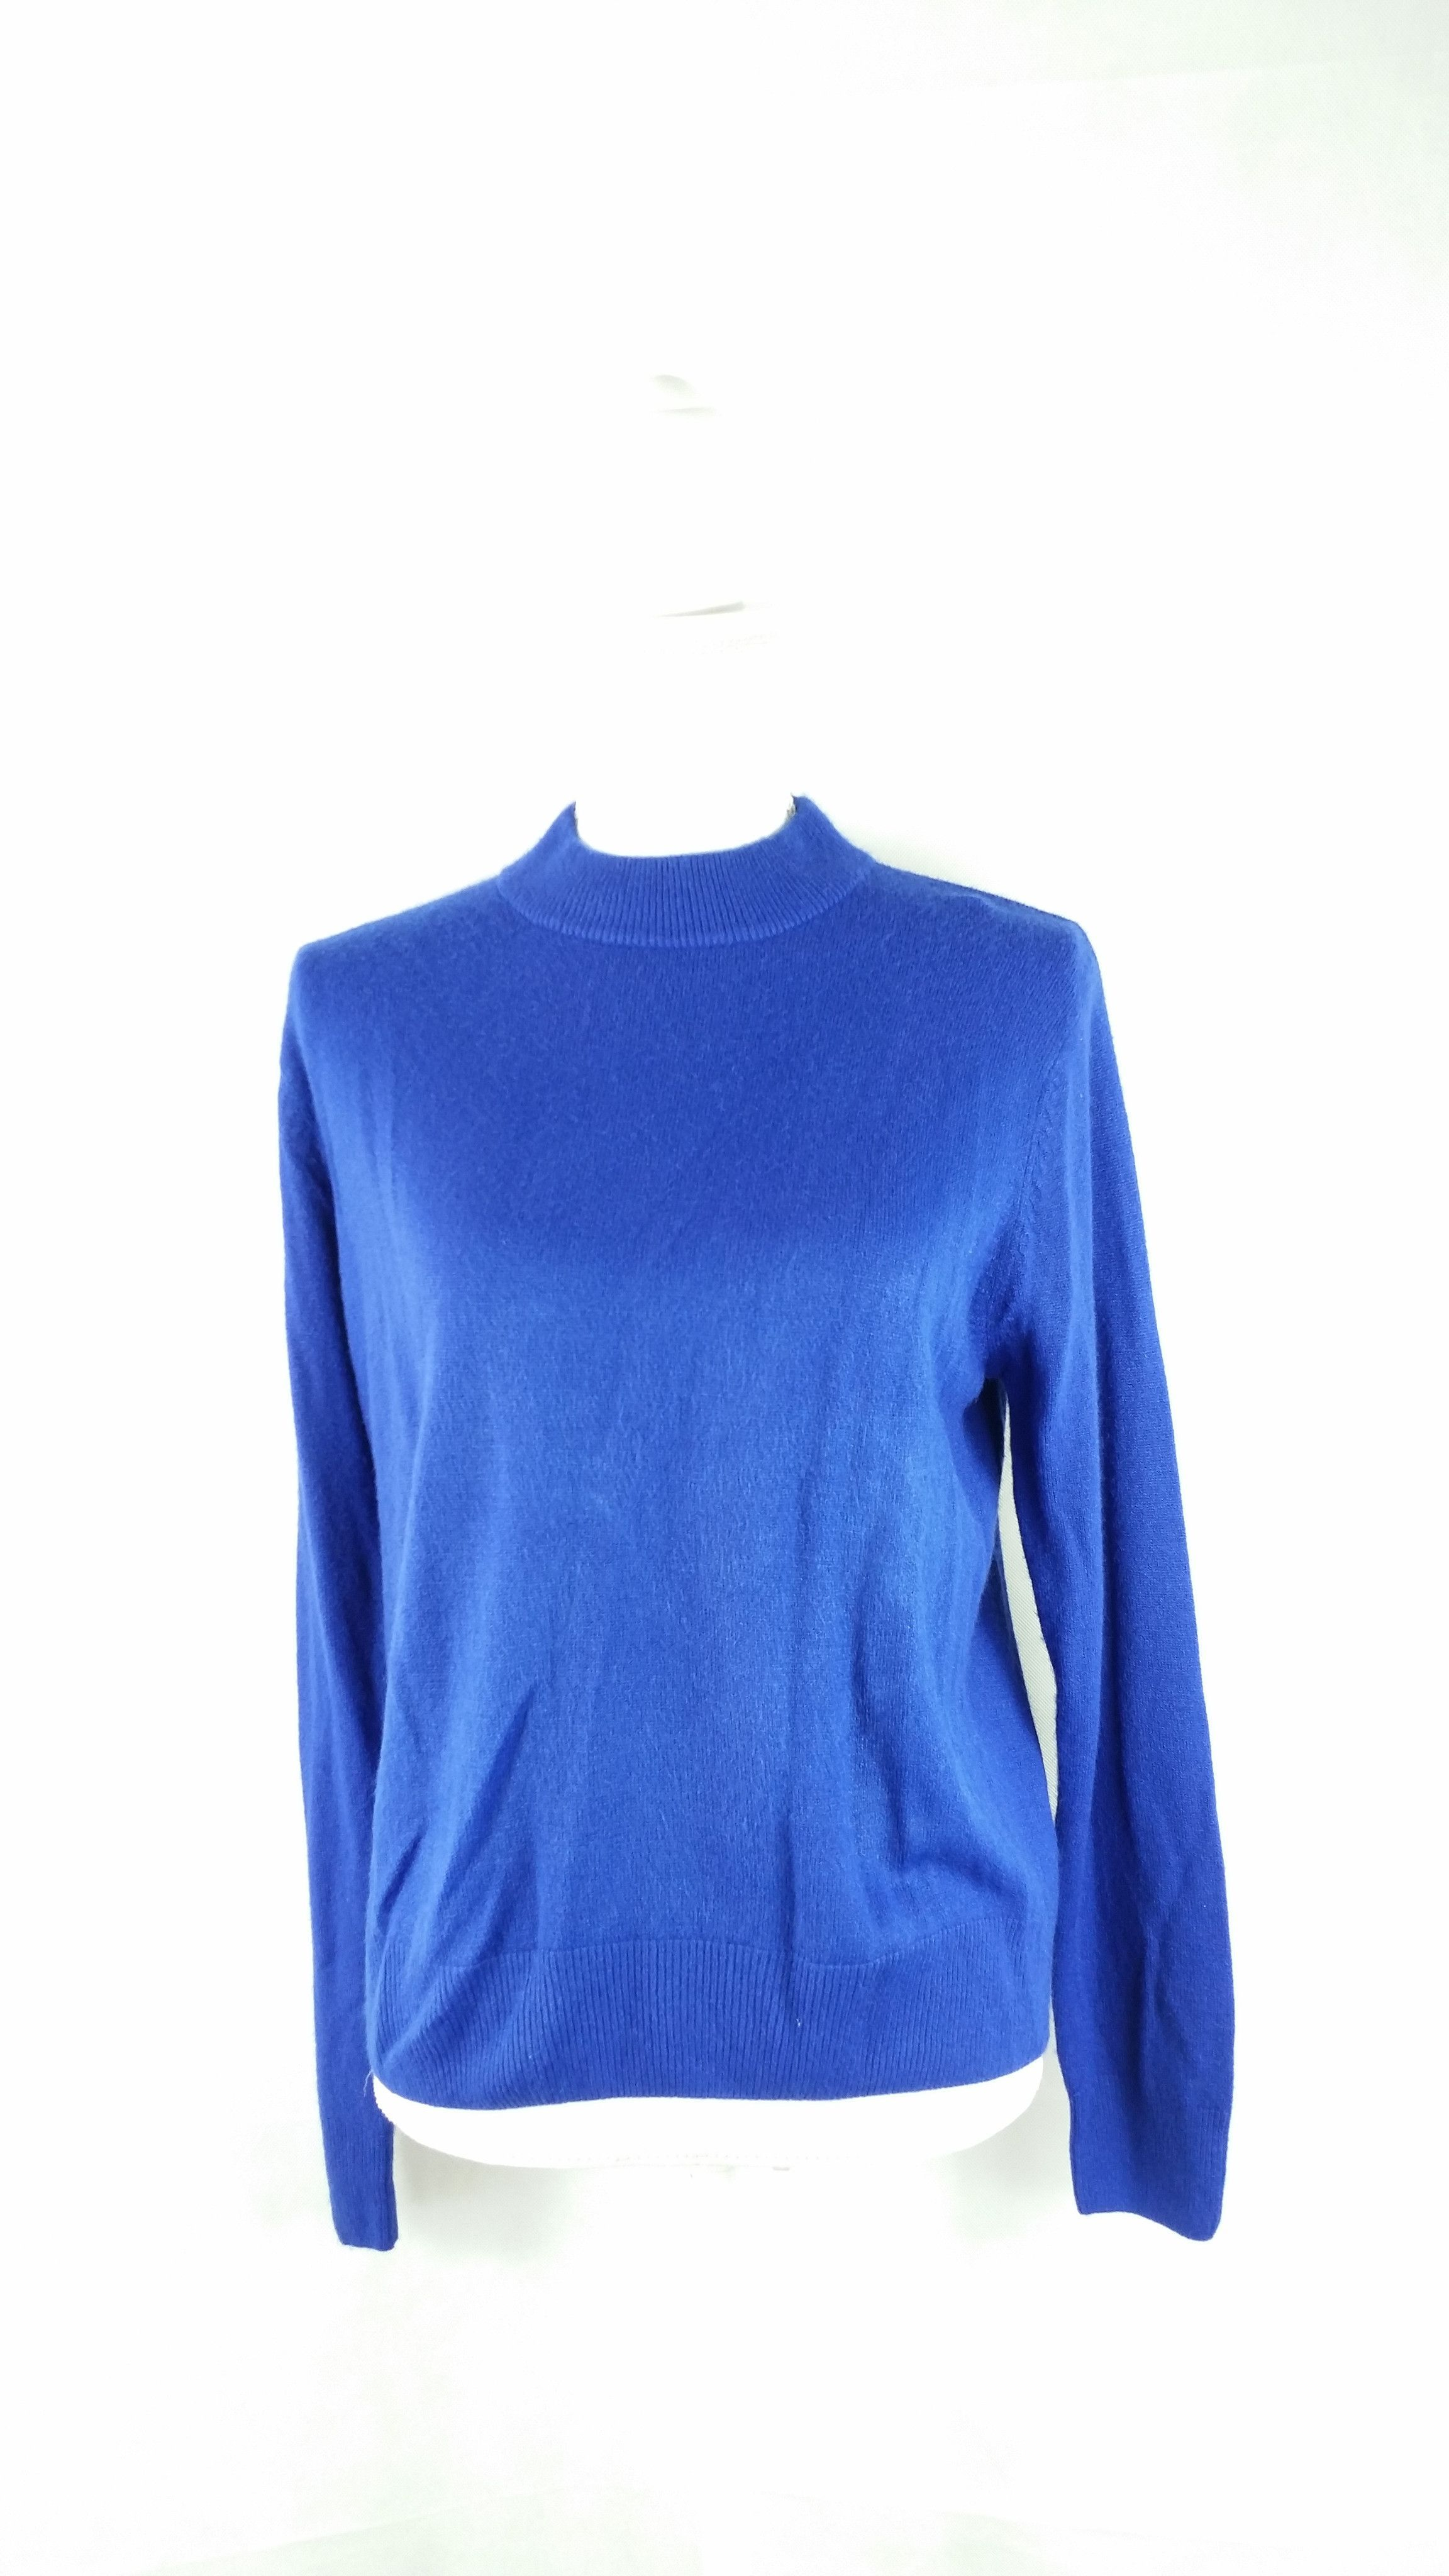 Vintage Royal Blue Mock Turtleneck Sweater Sz Medium | Tops ...